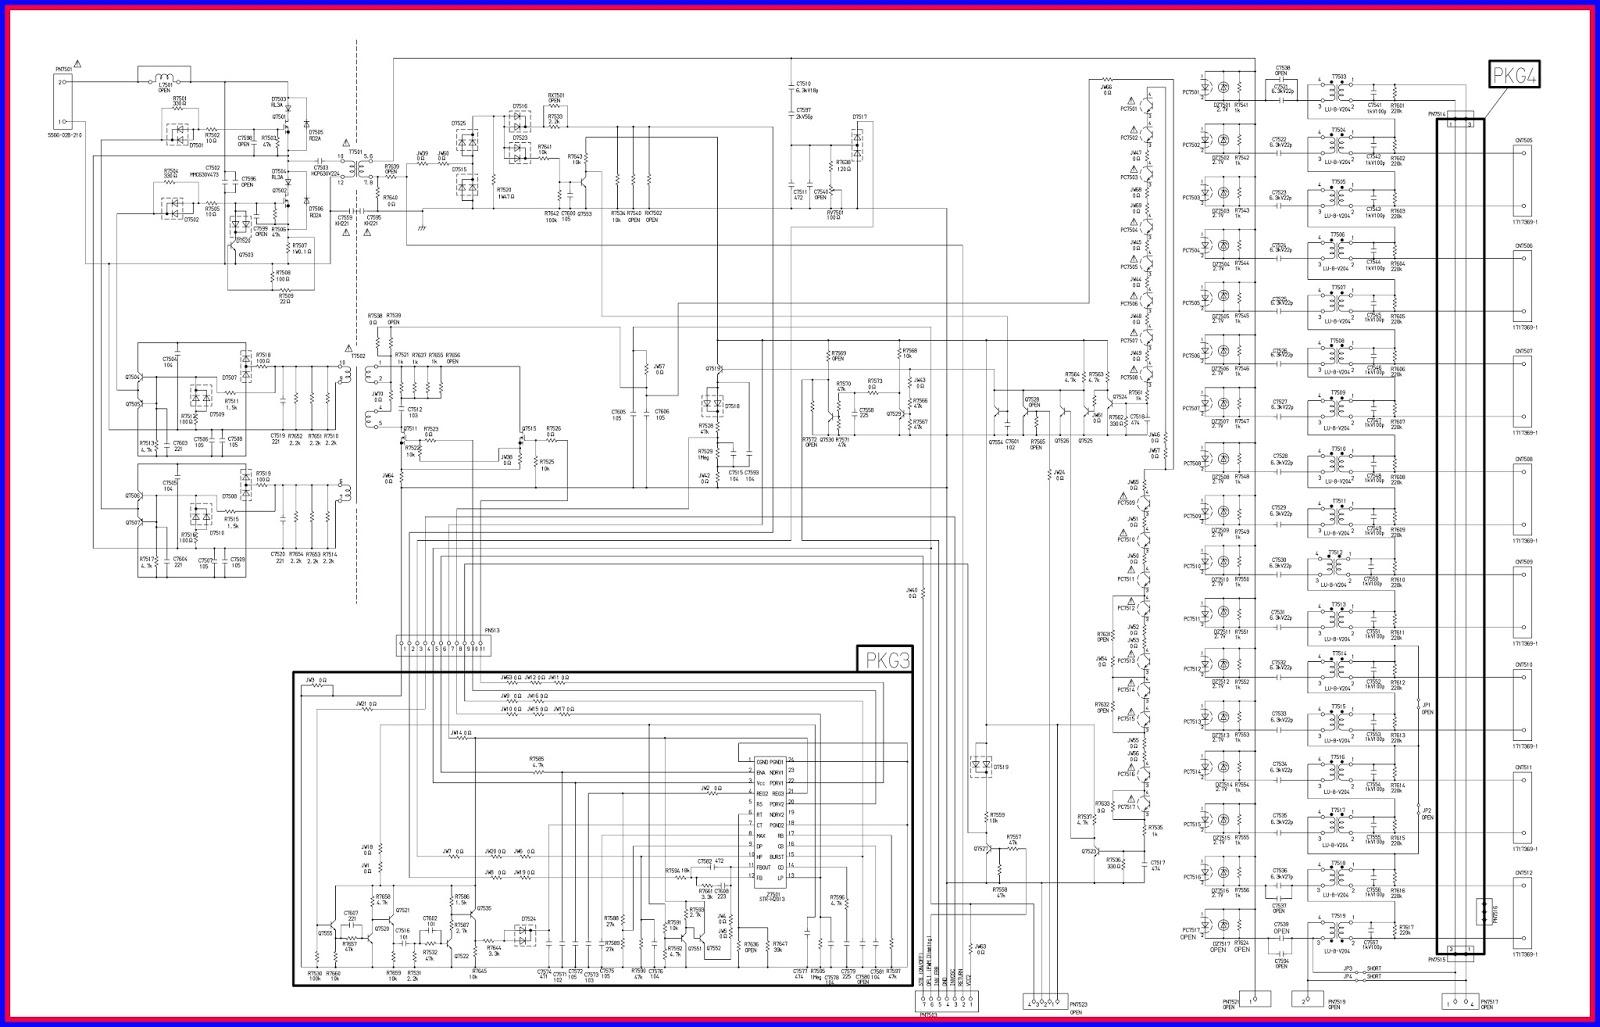 Electronic equipment repair centre sharp lc 26p50e lc 32p50e lc inverter circuit asfbconference2016 Gallery